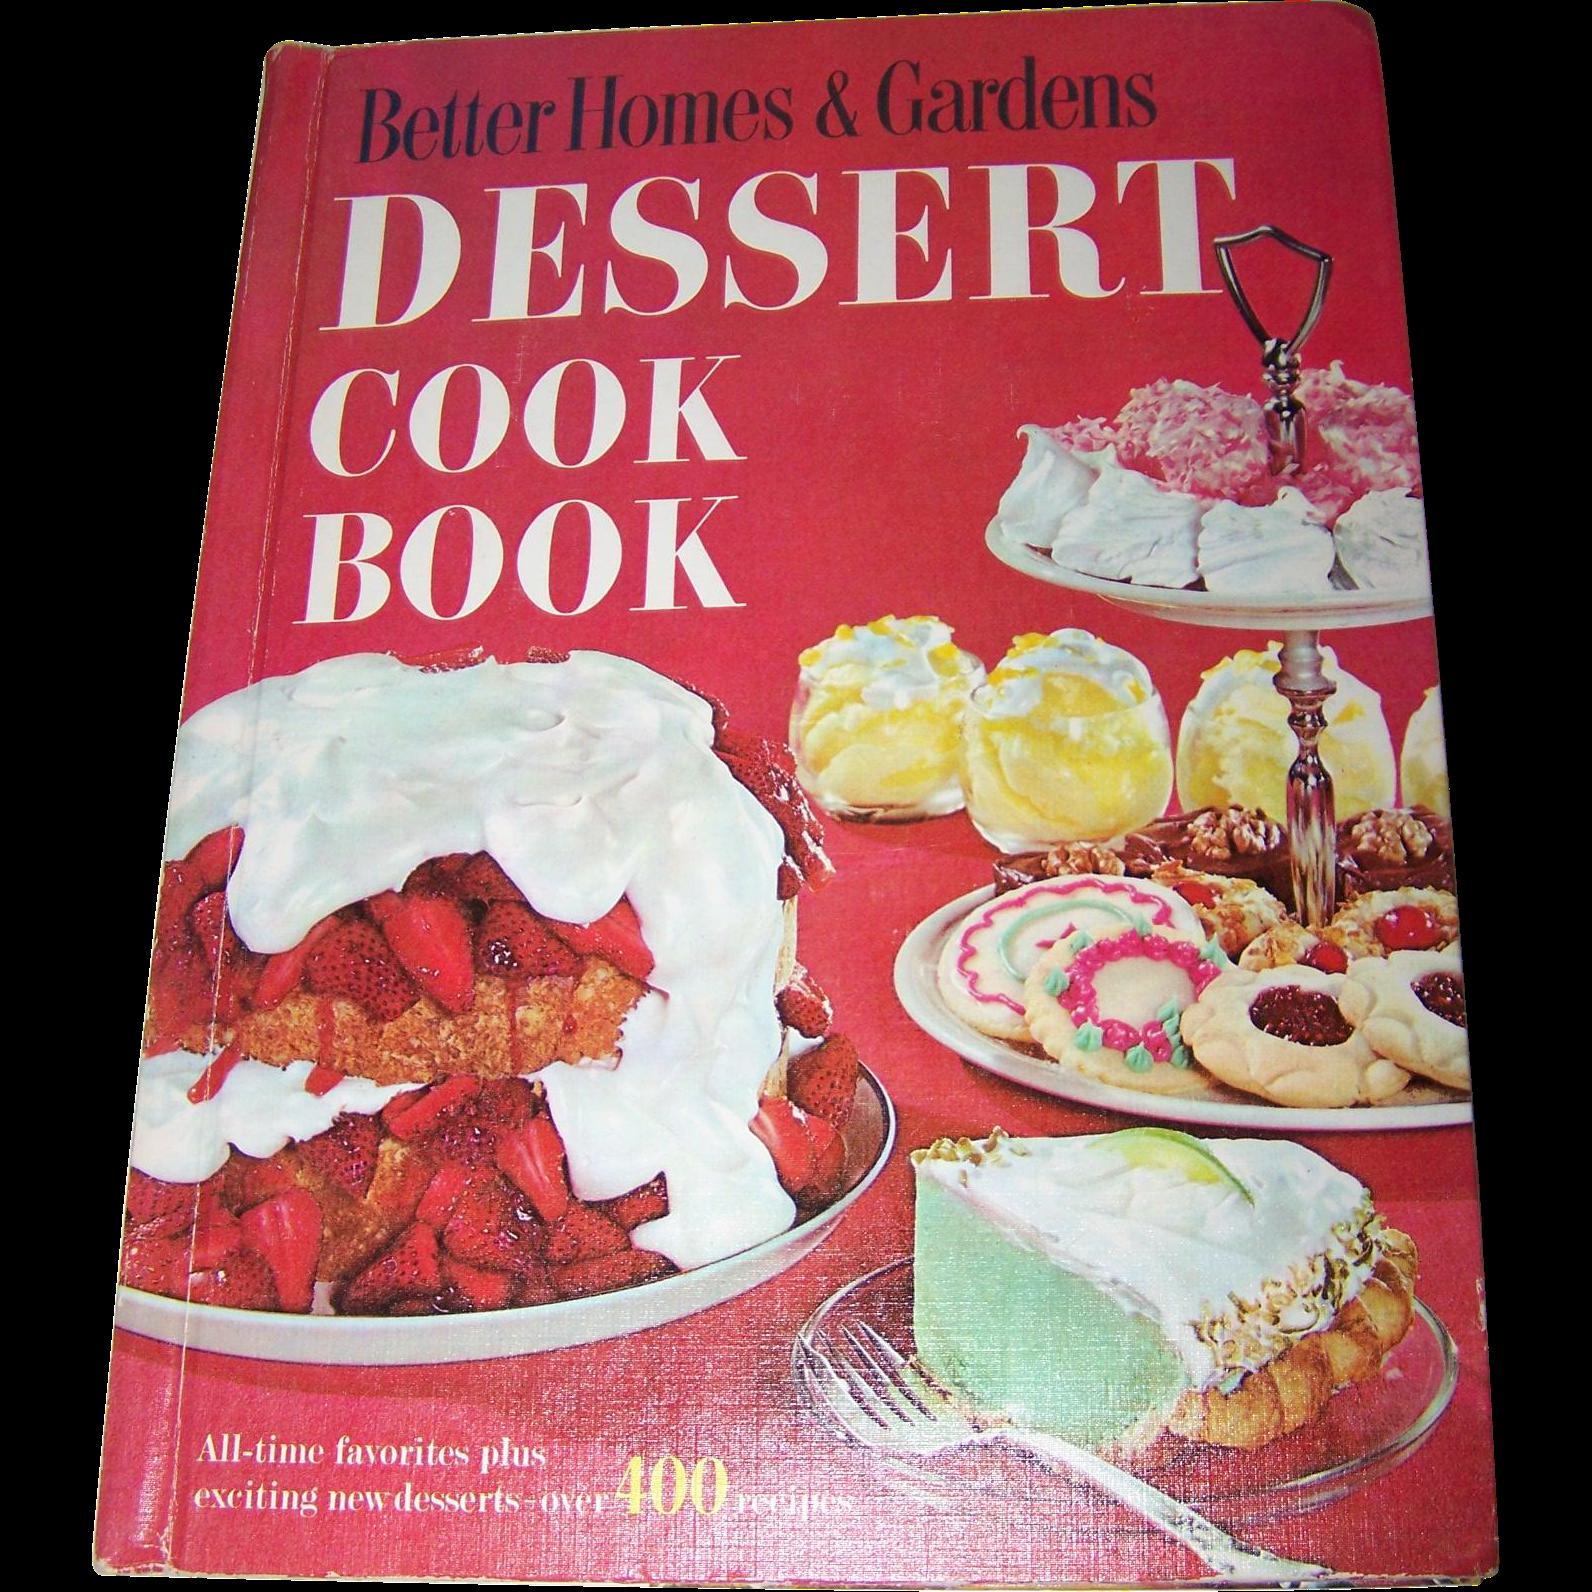 Better Homes& Gardens Dessert Cook Book Over 400 Recipes